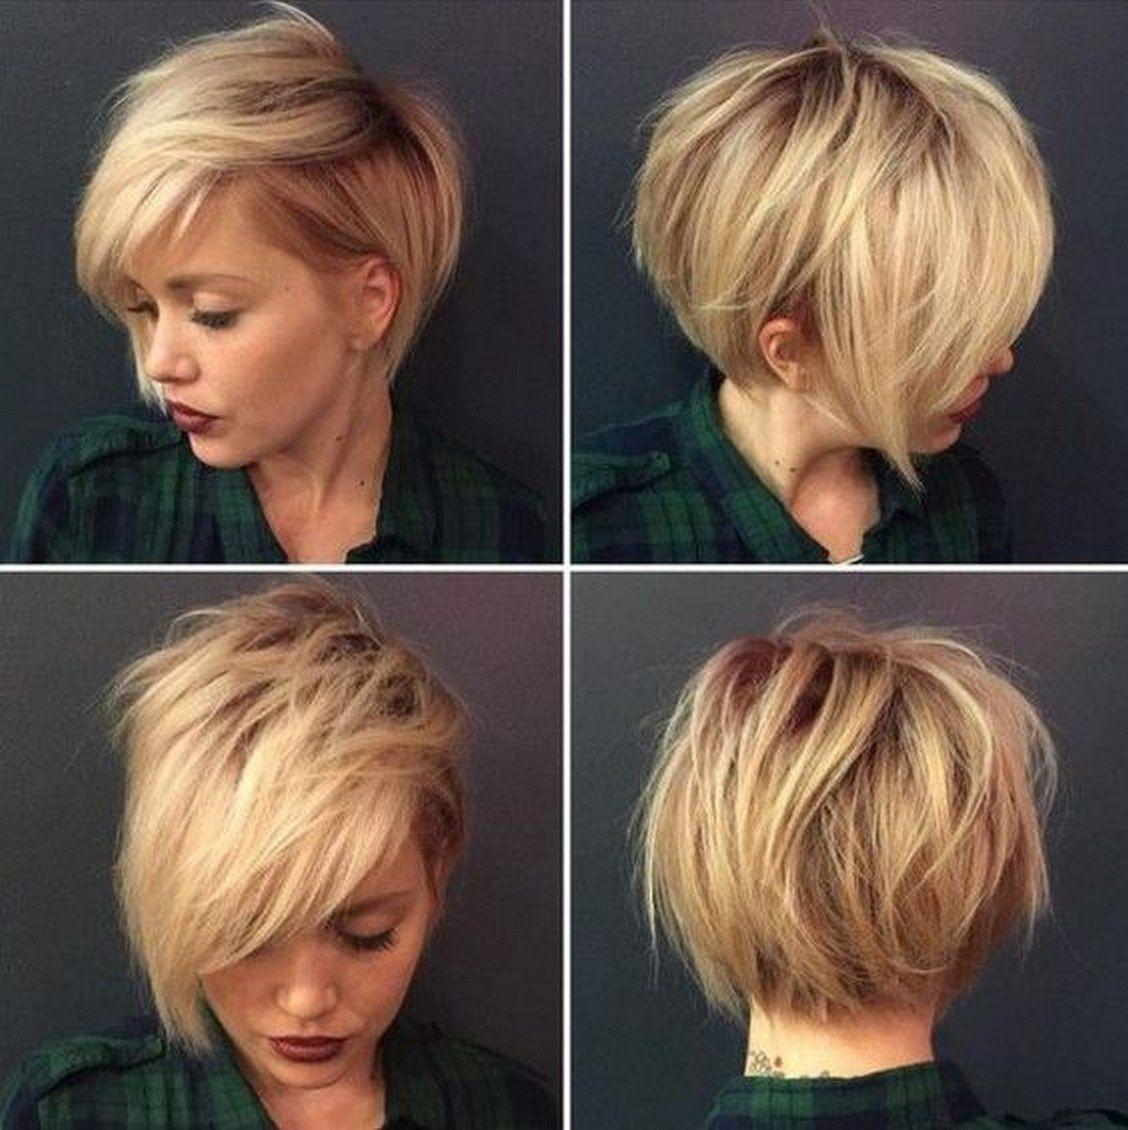 Short hairstyle and haircuts (151) | Hair mania | Pinterest | Short ...